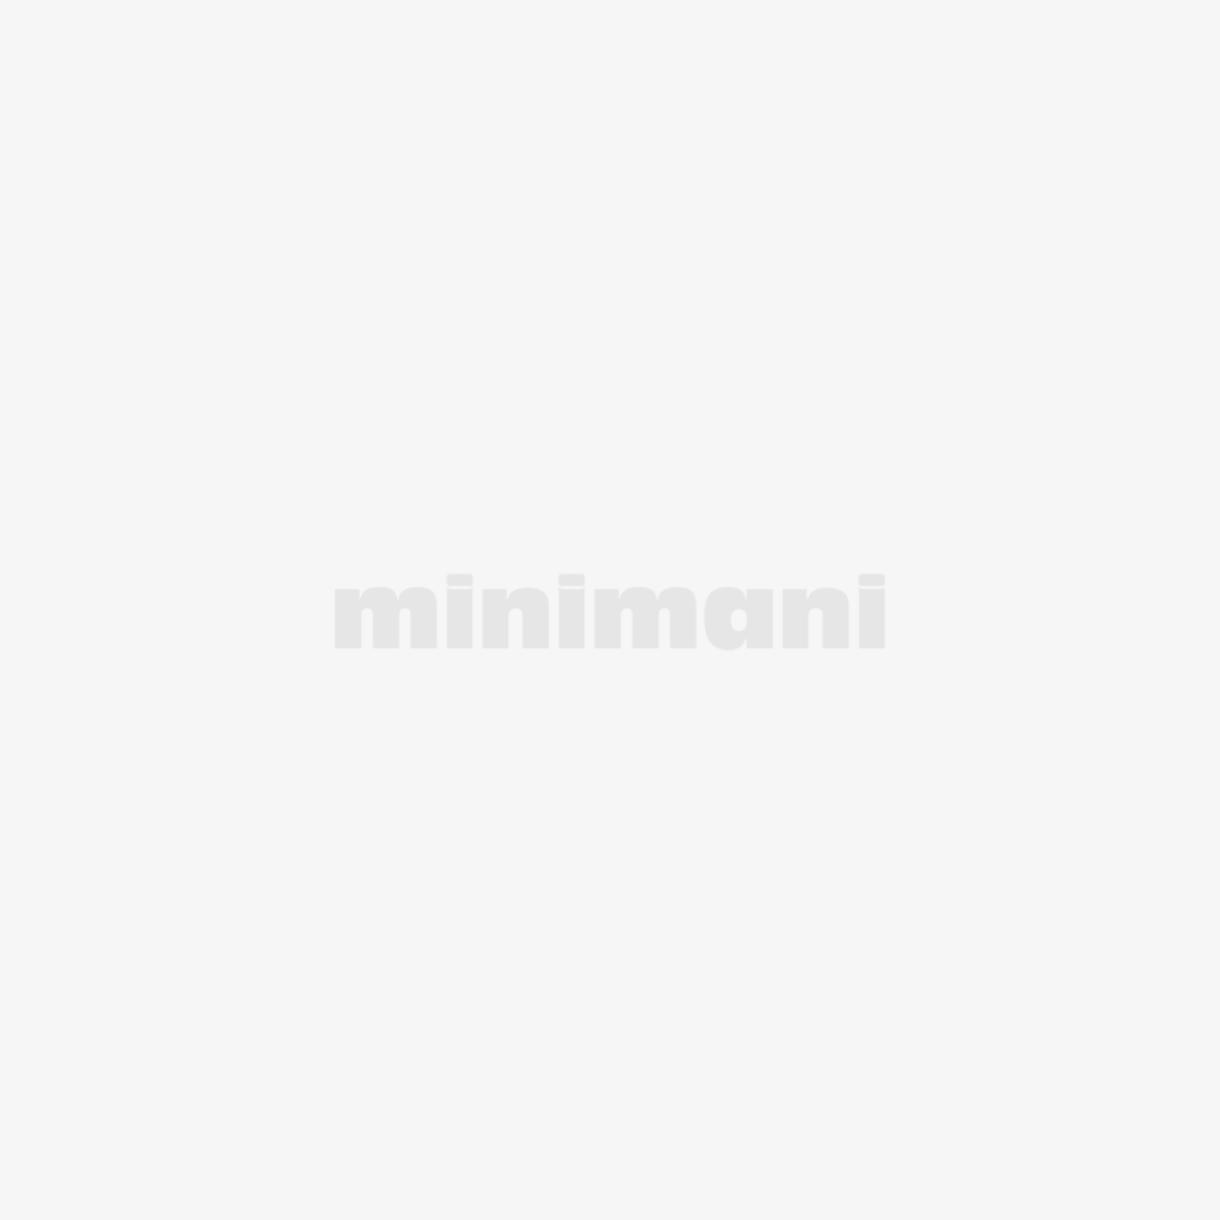 Vallila matto 80x160cm, Touko harmaa